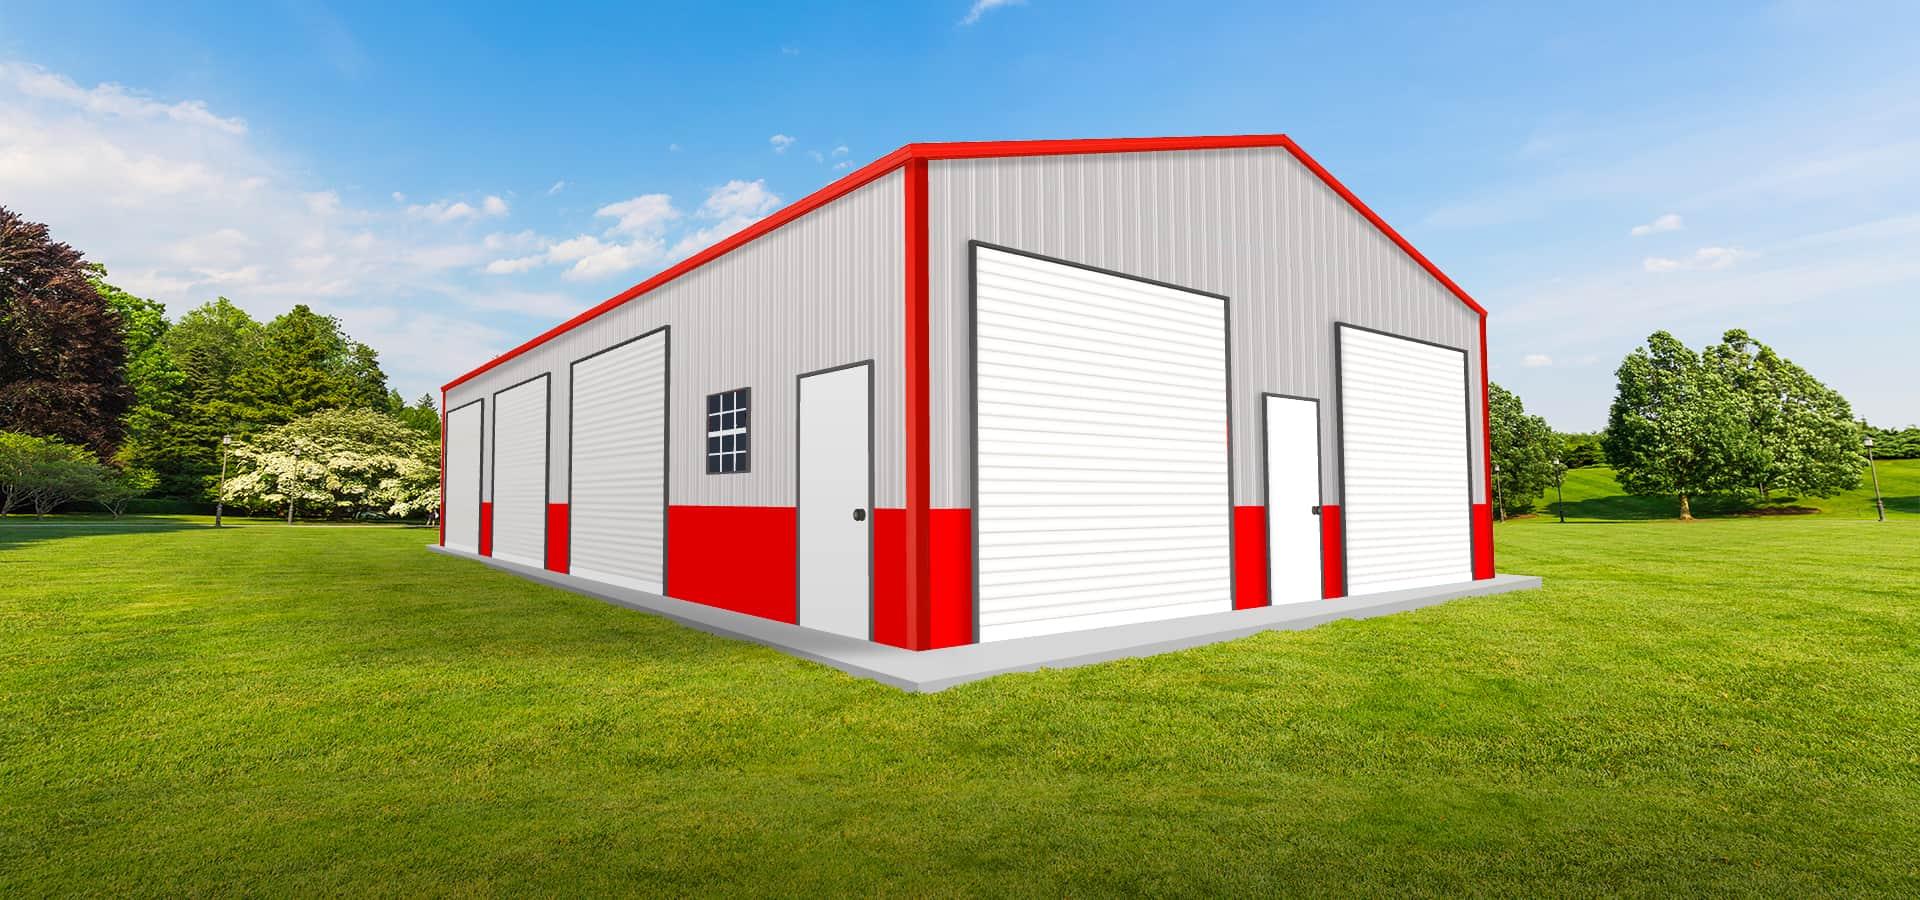 Carport Direct 1 Ecommerce Carport Dealer Buy Carports And Metal Structures Online